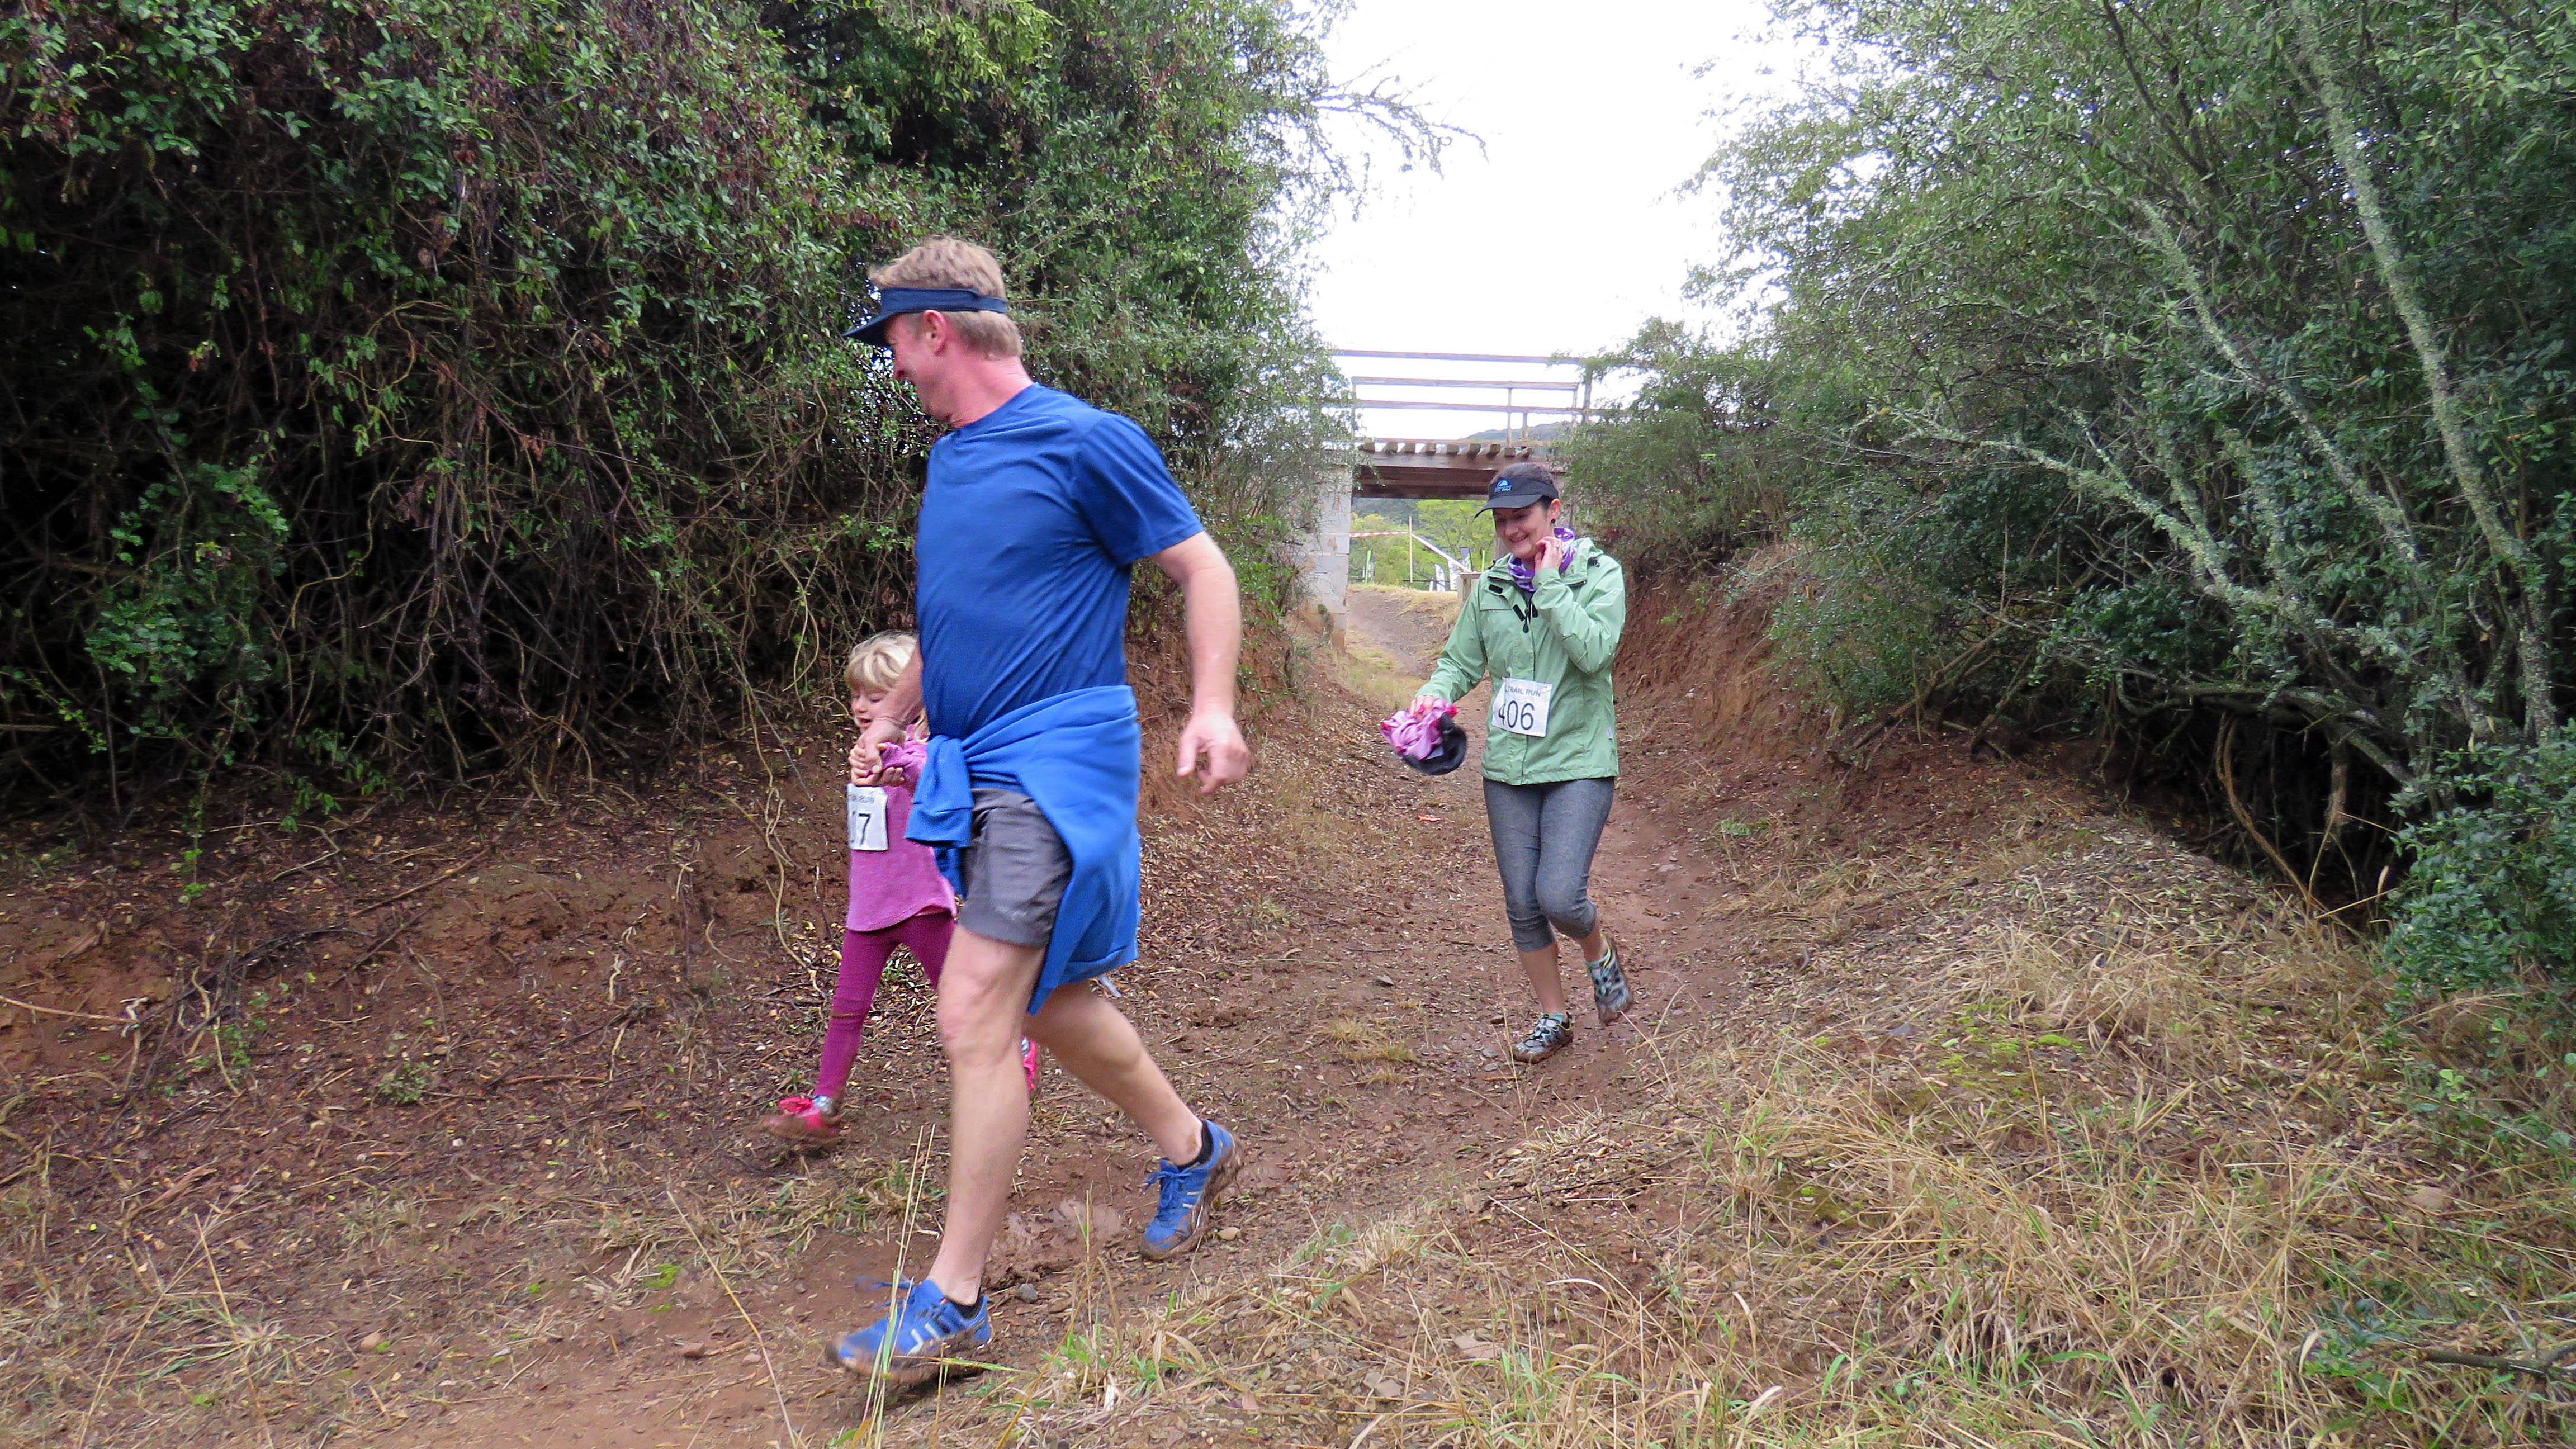 hayterdale trailrun 2018-08-05  (47)